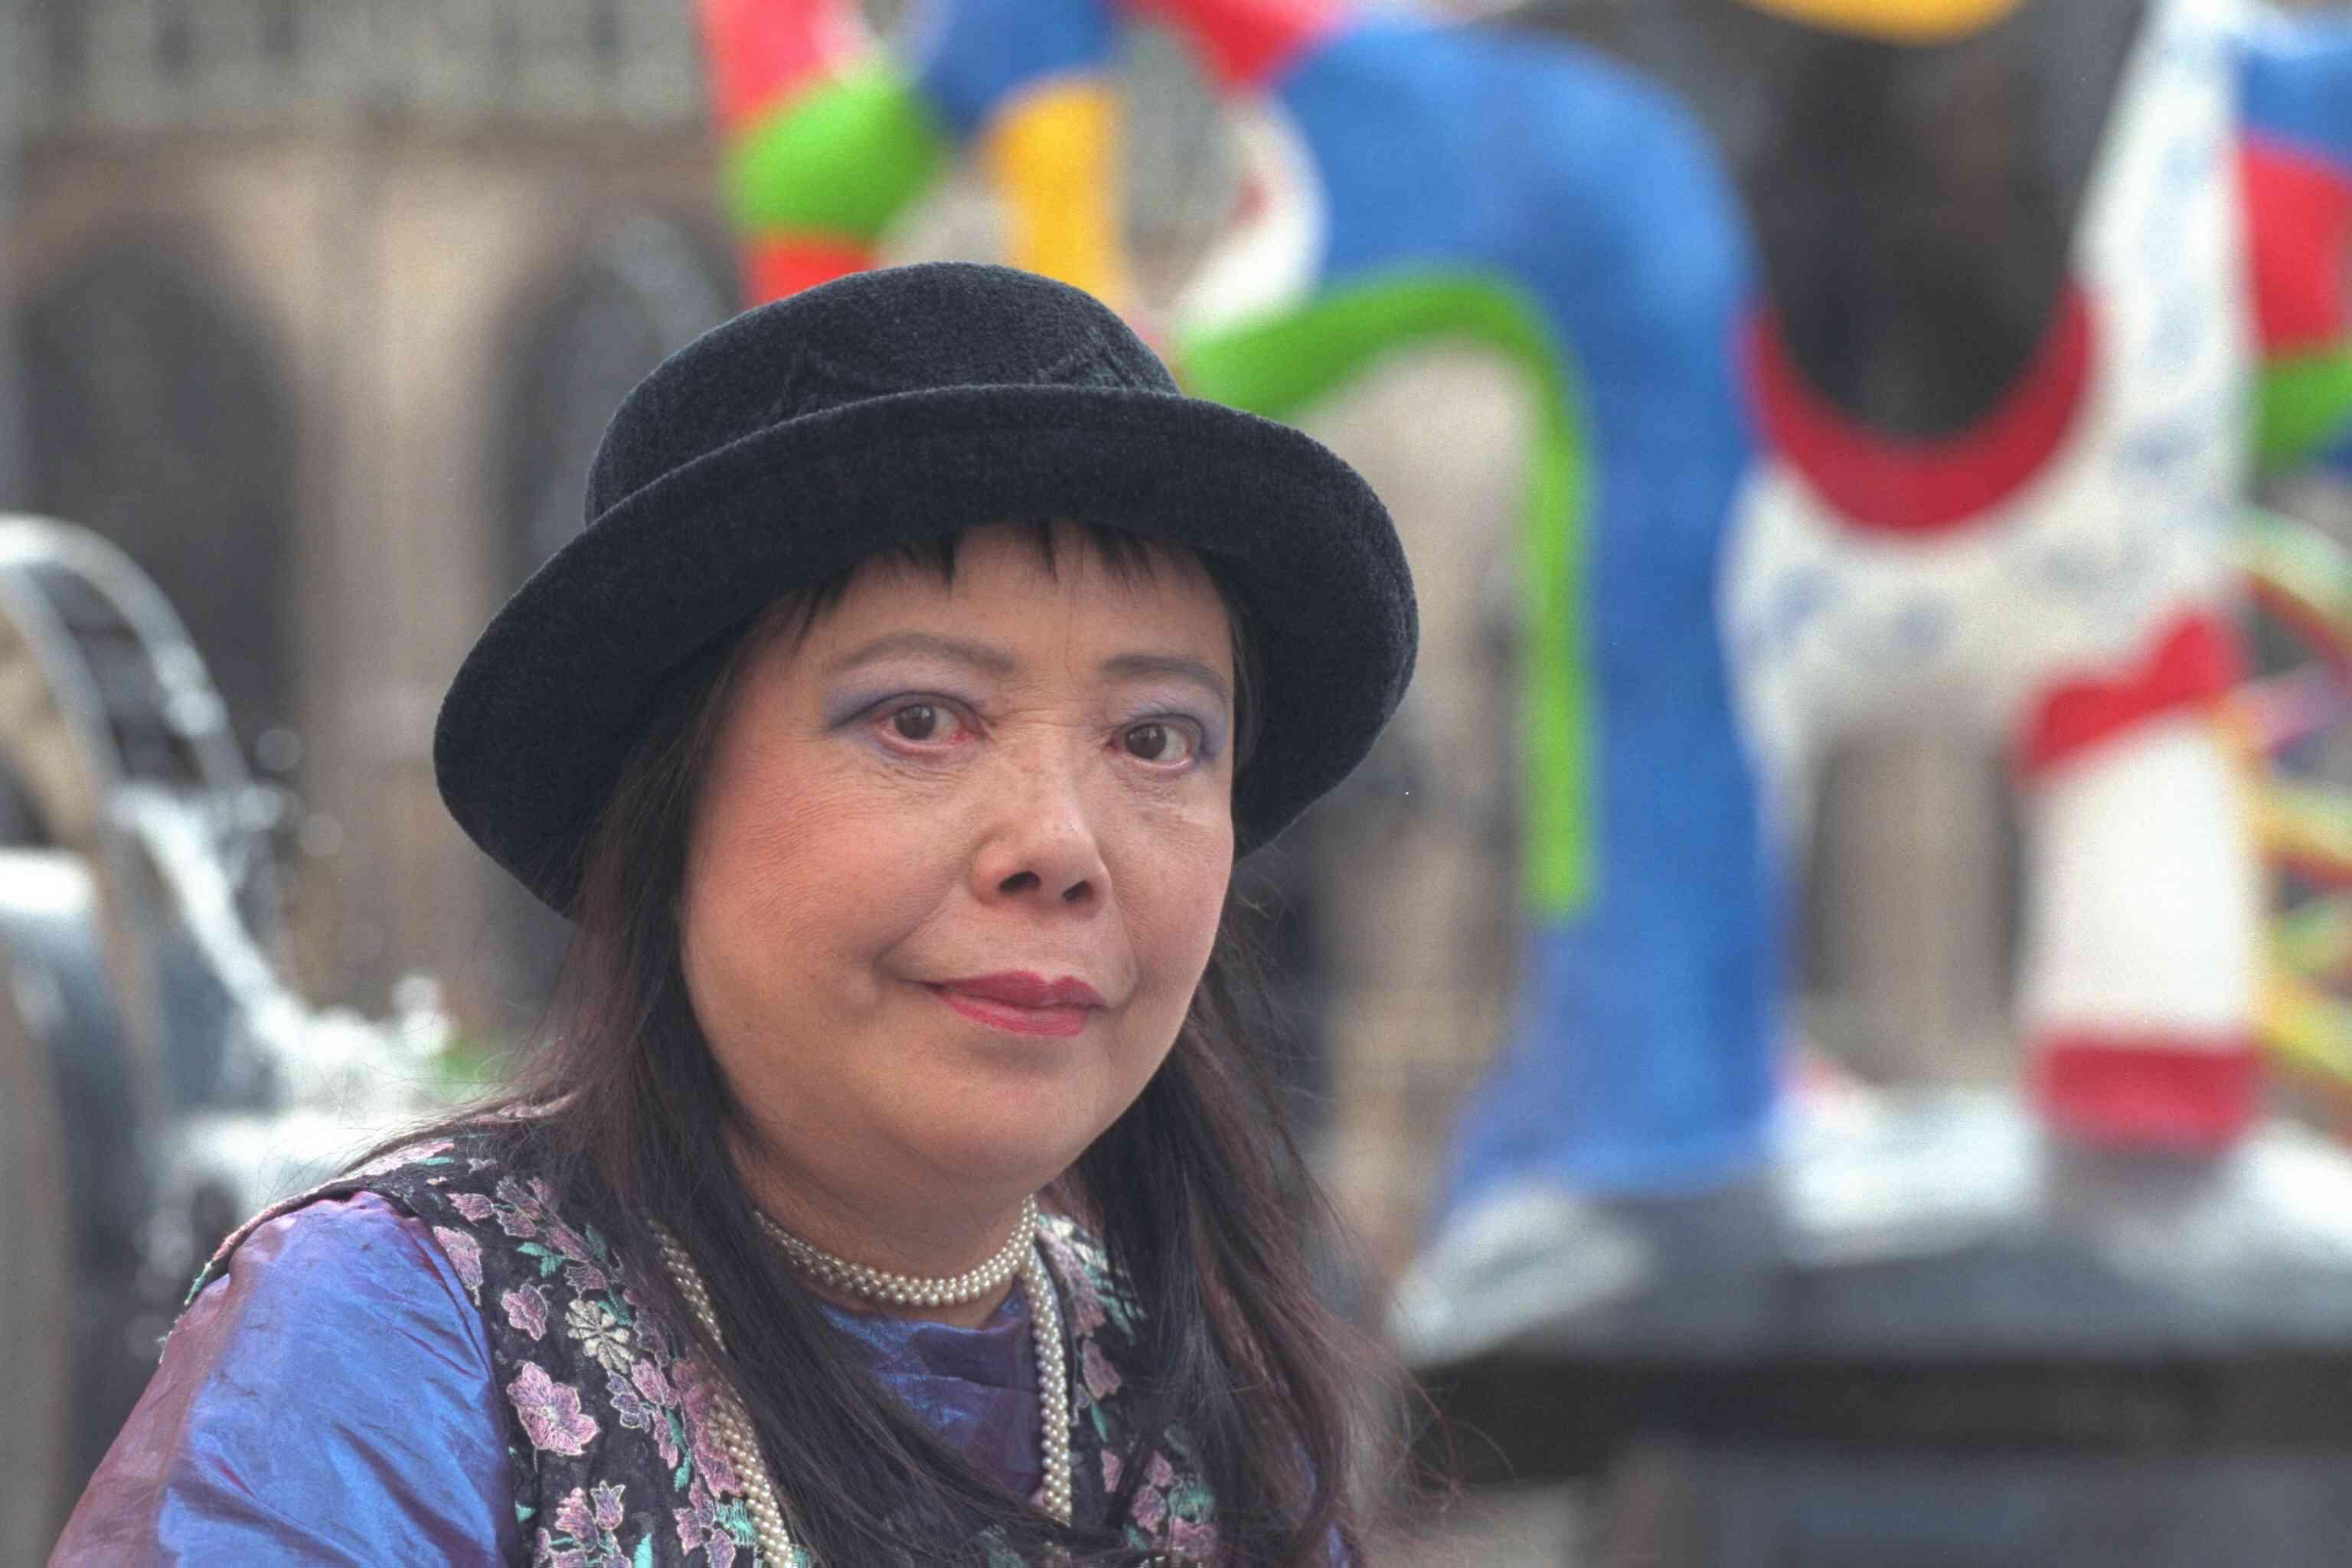 PARIS: YAYOI KUSAMA EXHIBITION AT 3 VENUES